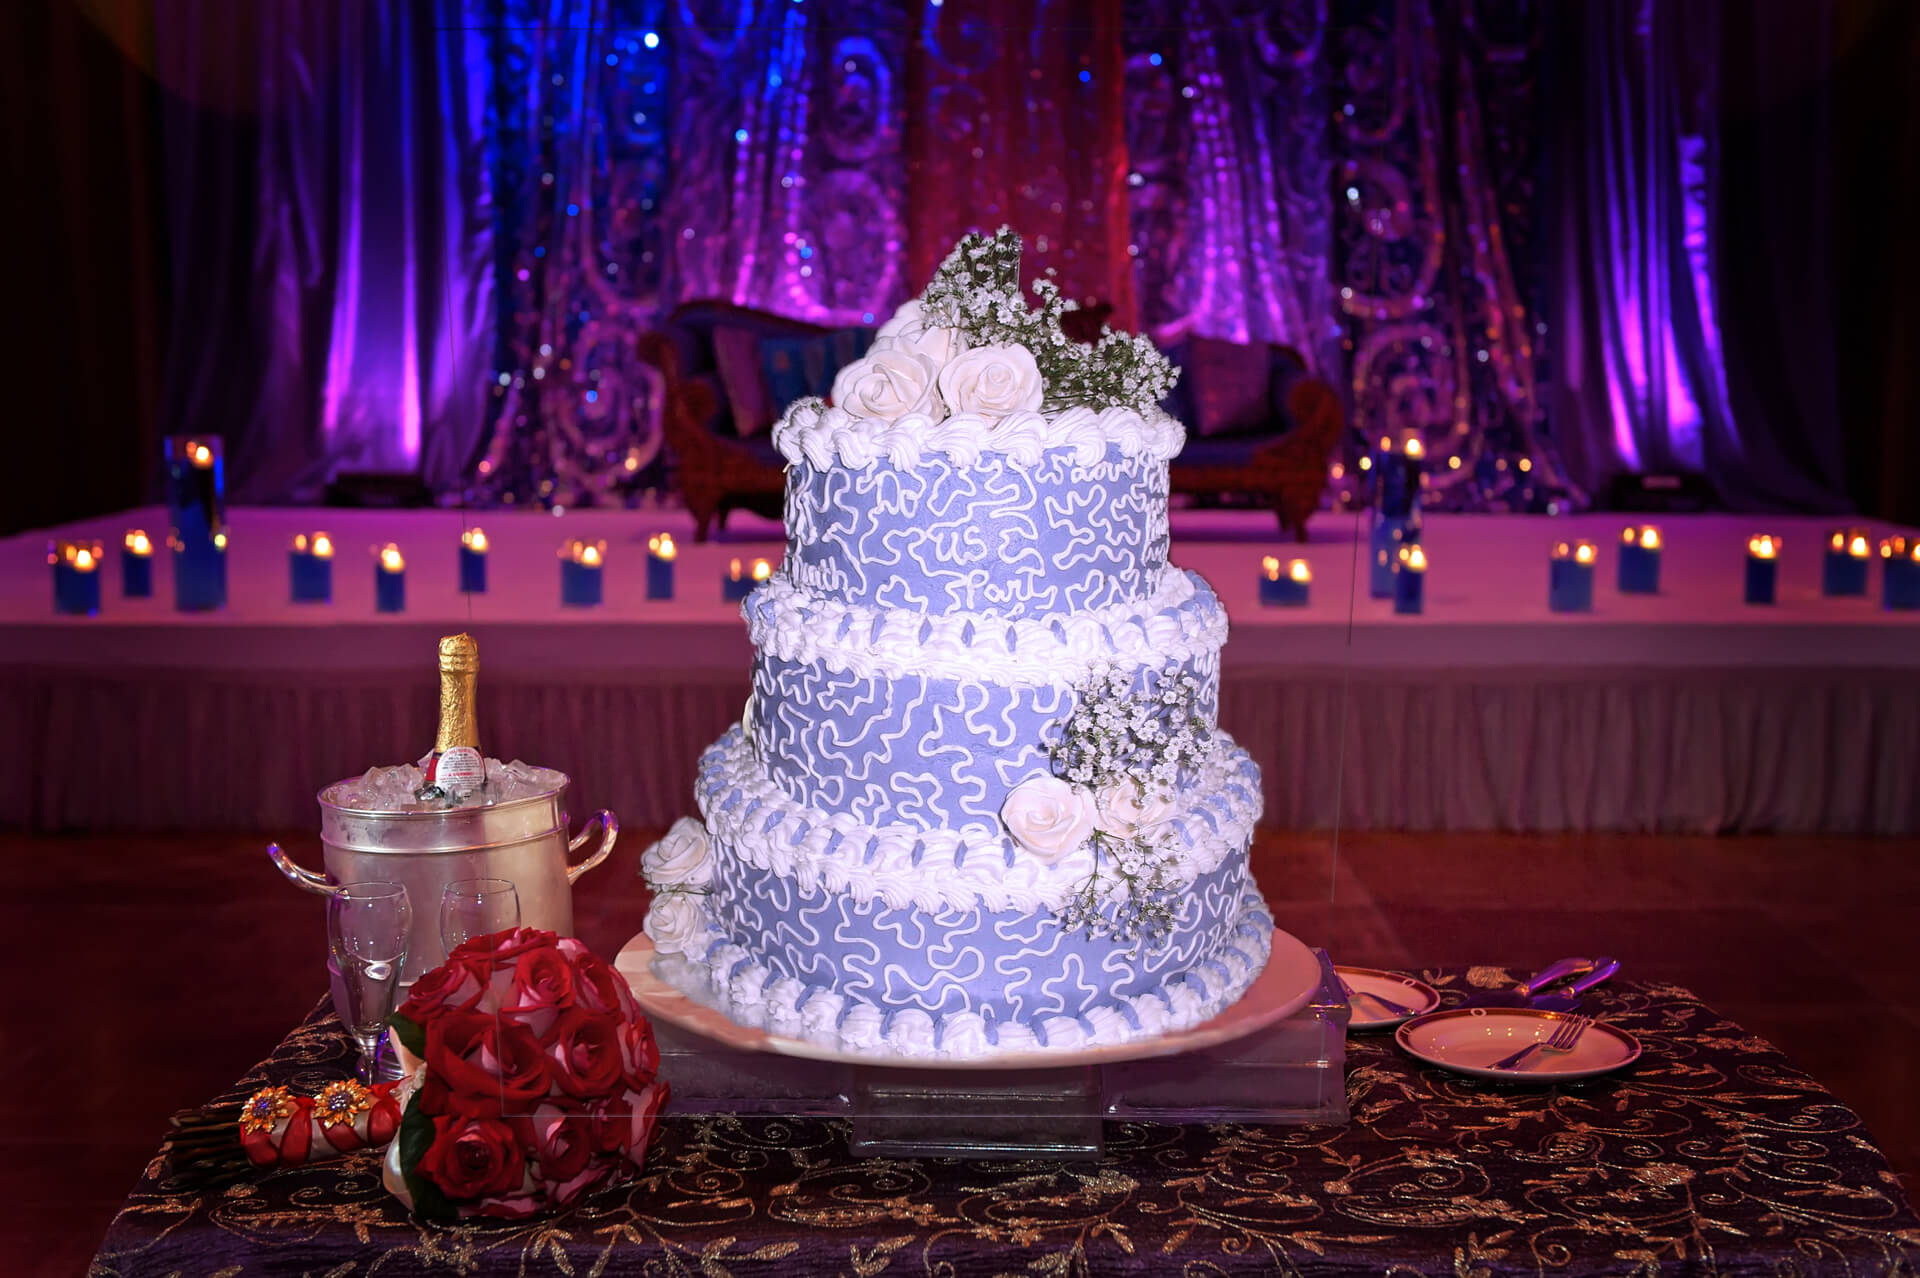 Astounding All Ours Custom Cakes Charlotte Nc Birthday Cakes Wedding Personalised Birthday Cards Veneteletsinfo